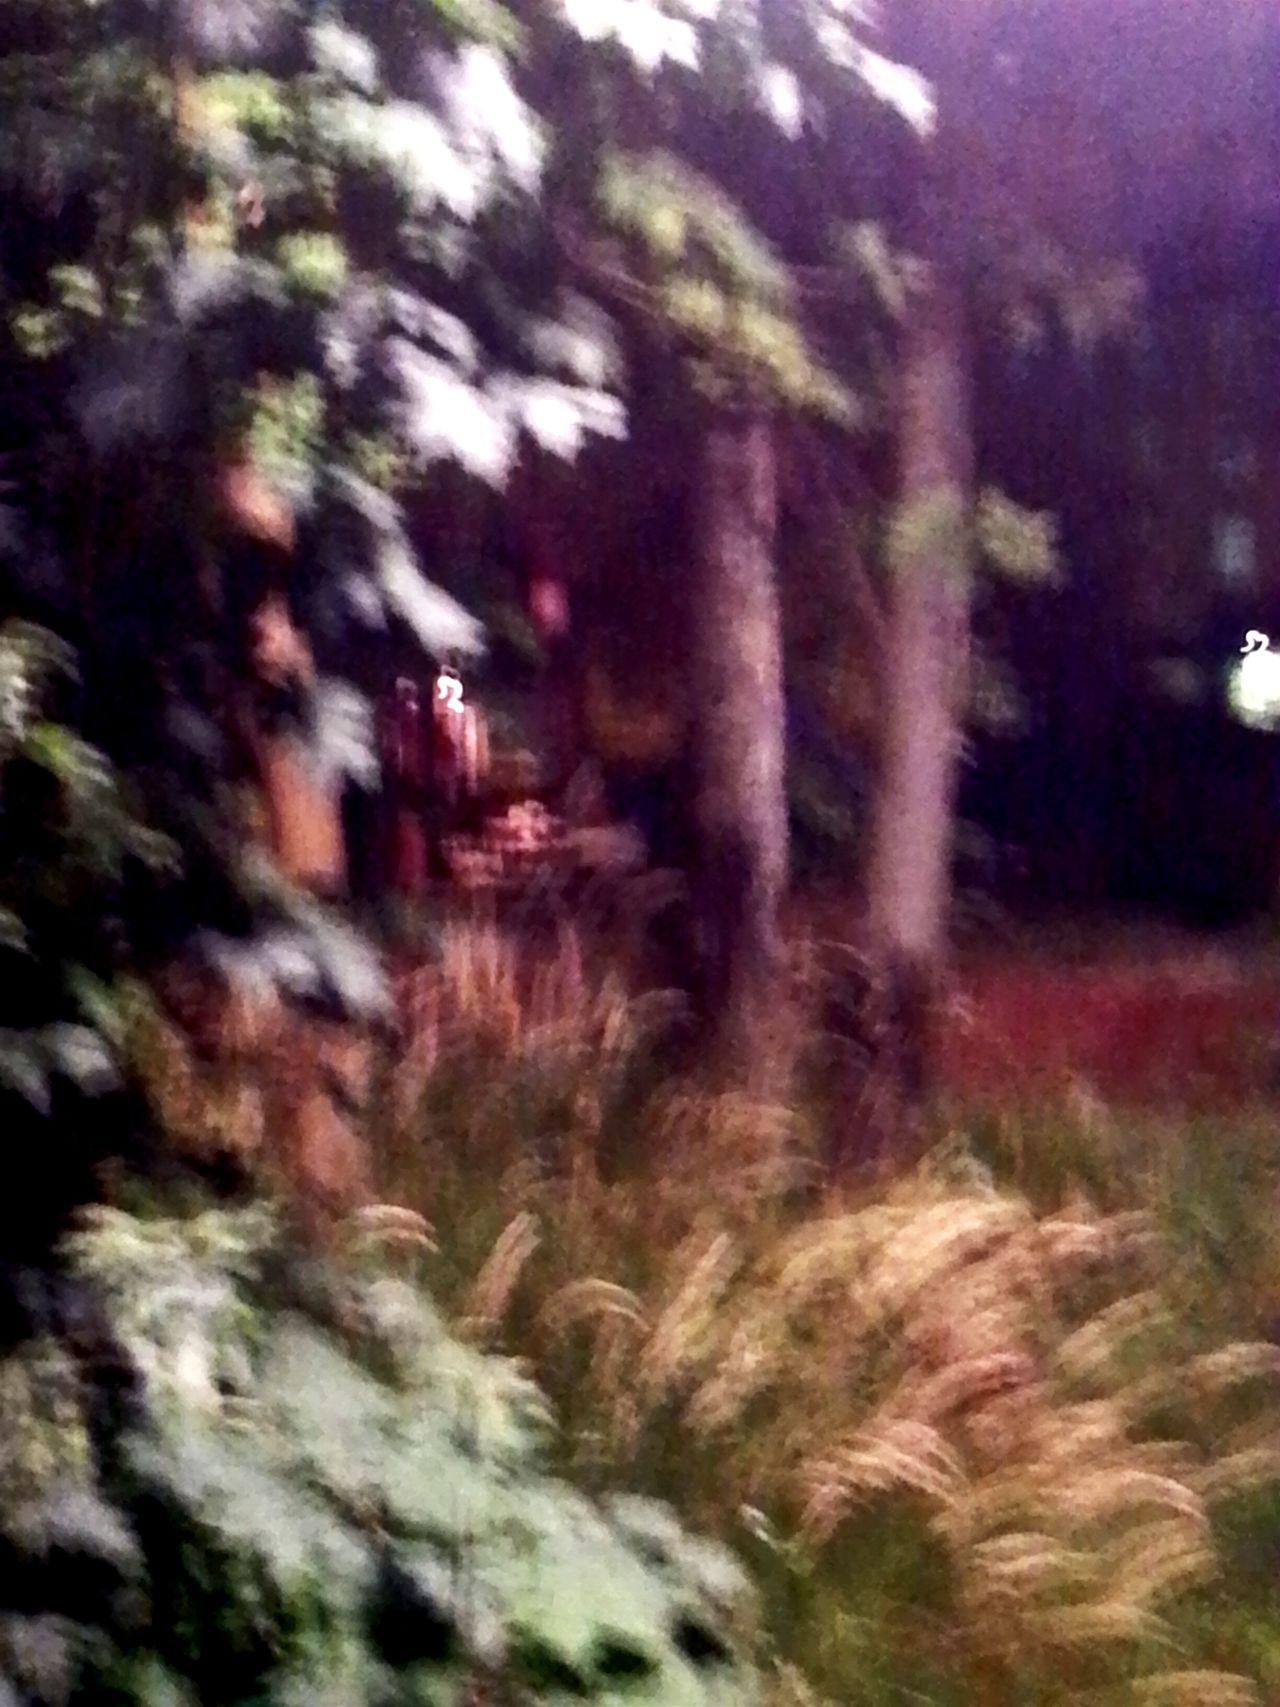 TreePorn Magical Nightvision Strange Photo Mystical Blur